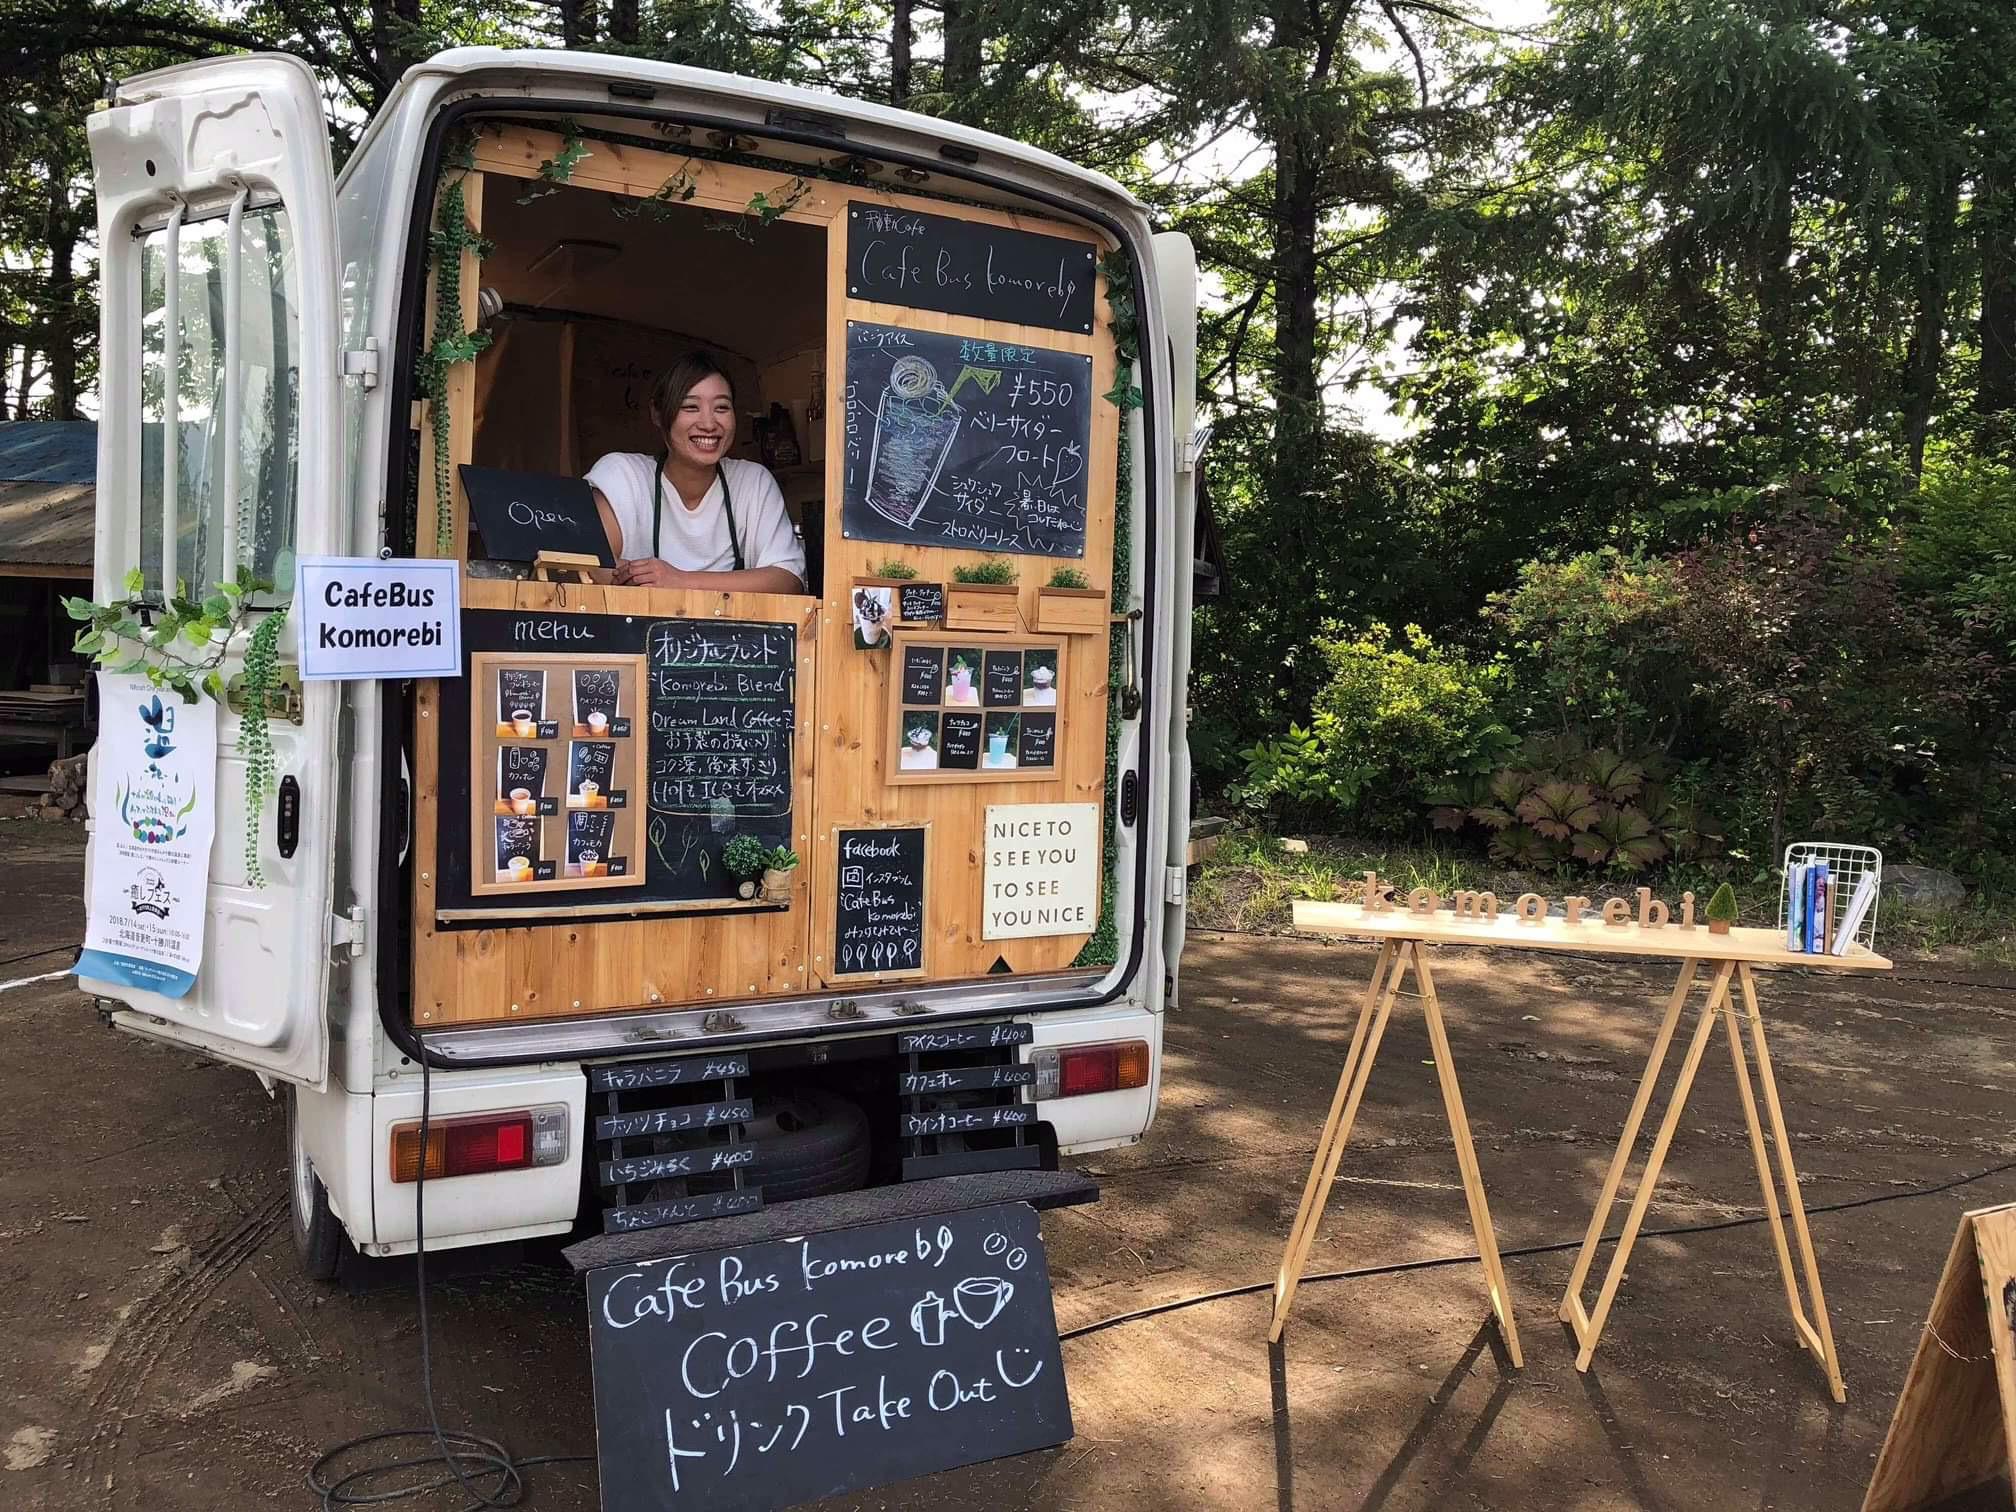 Cafe Bus komorebi